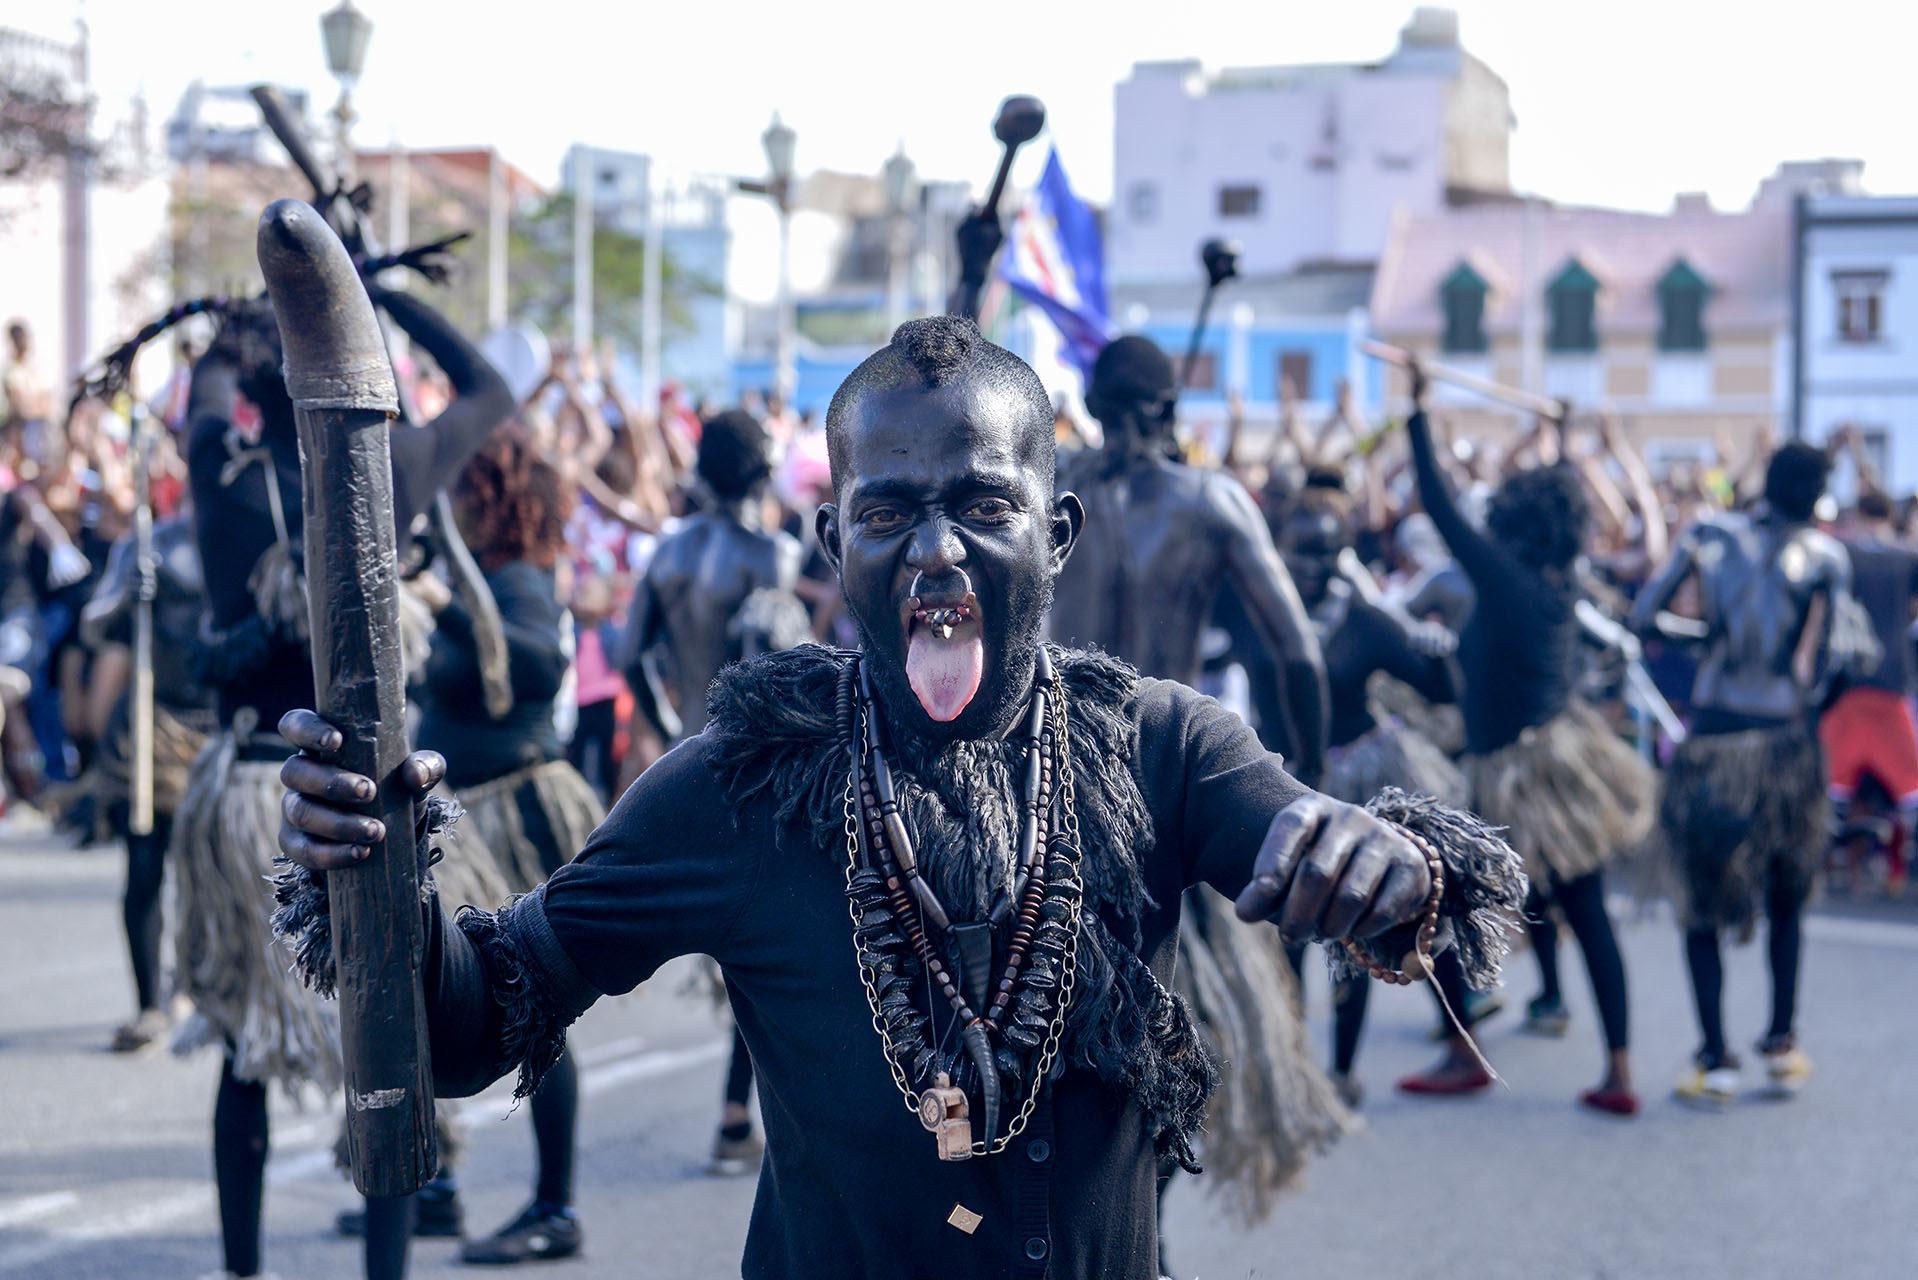 photos-carnaval-cap-vert-photographe-maya-angelsen-ile-de-france-val-de-marne-mindelo